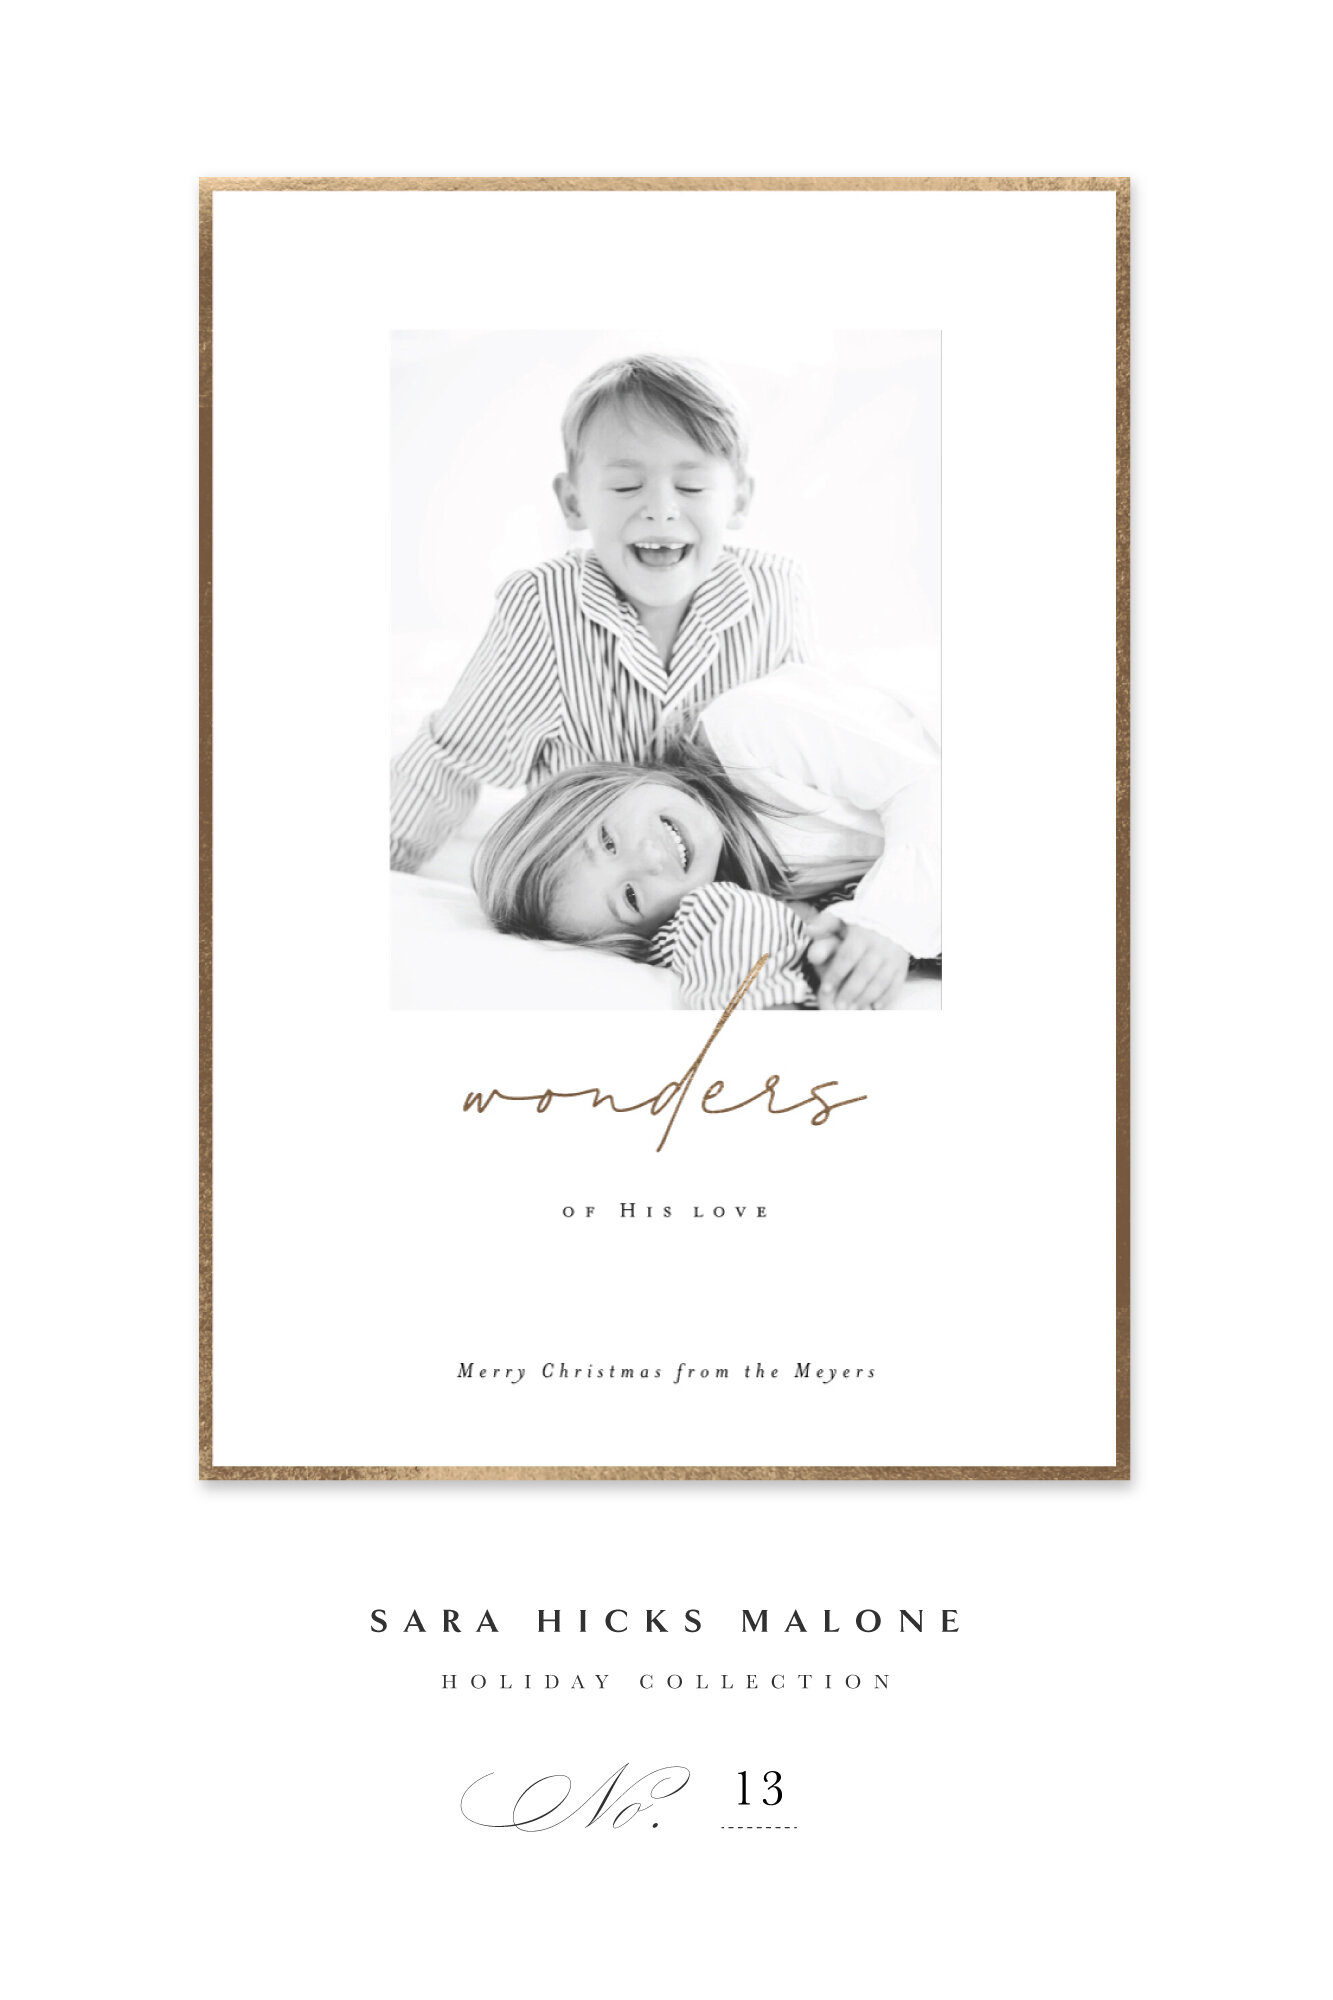 'WONDERS FRAME' by Sara Hicks Malone